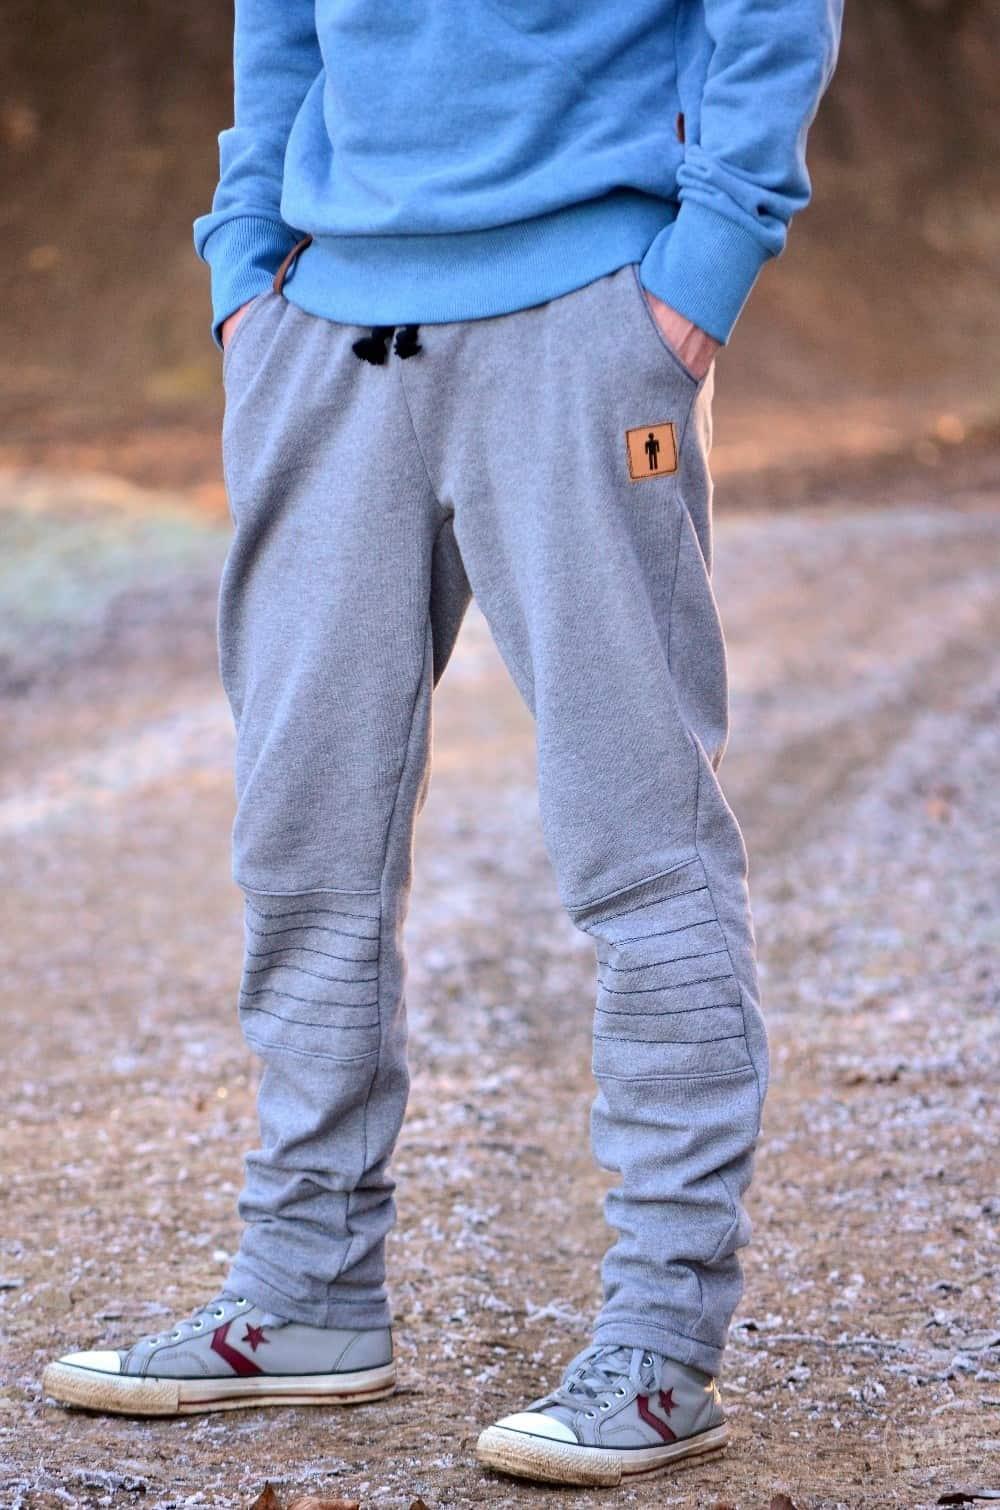 Schnittmuster Hose: Jogginghose nähen - Bild 8 | textilsucht.de